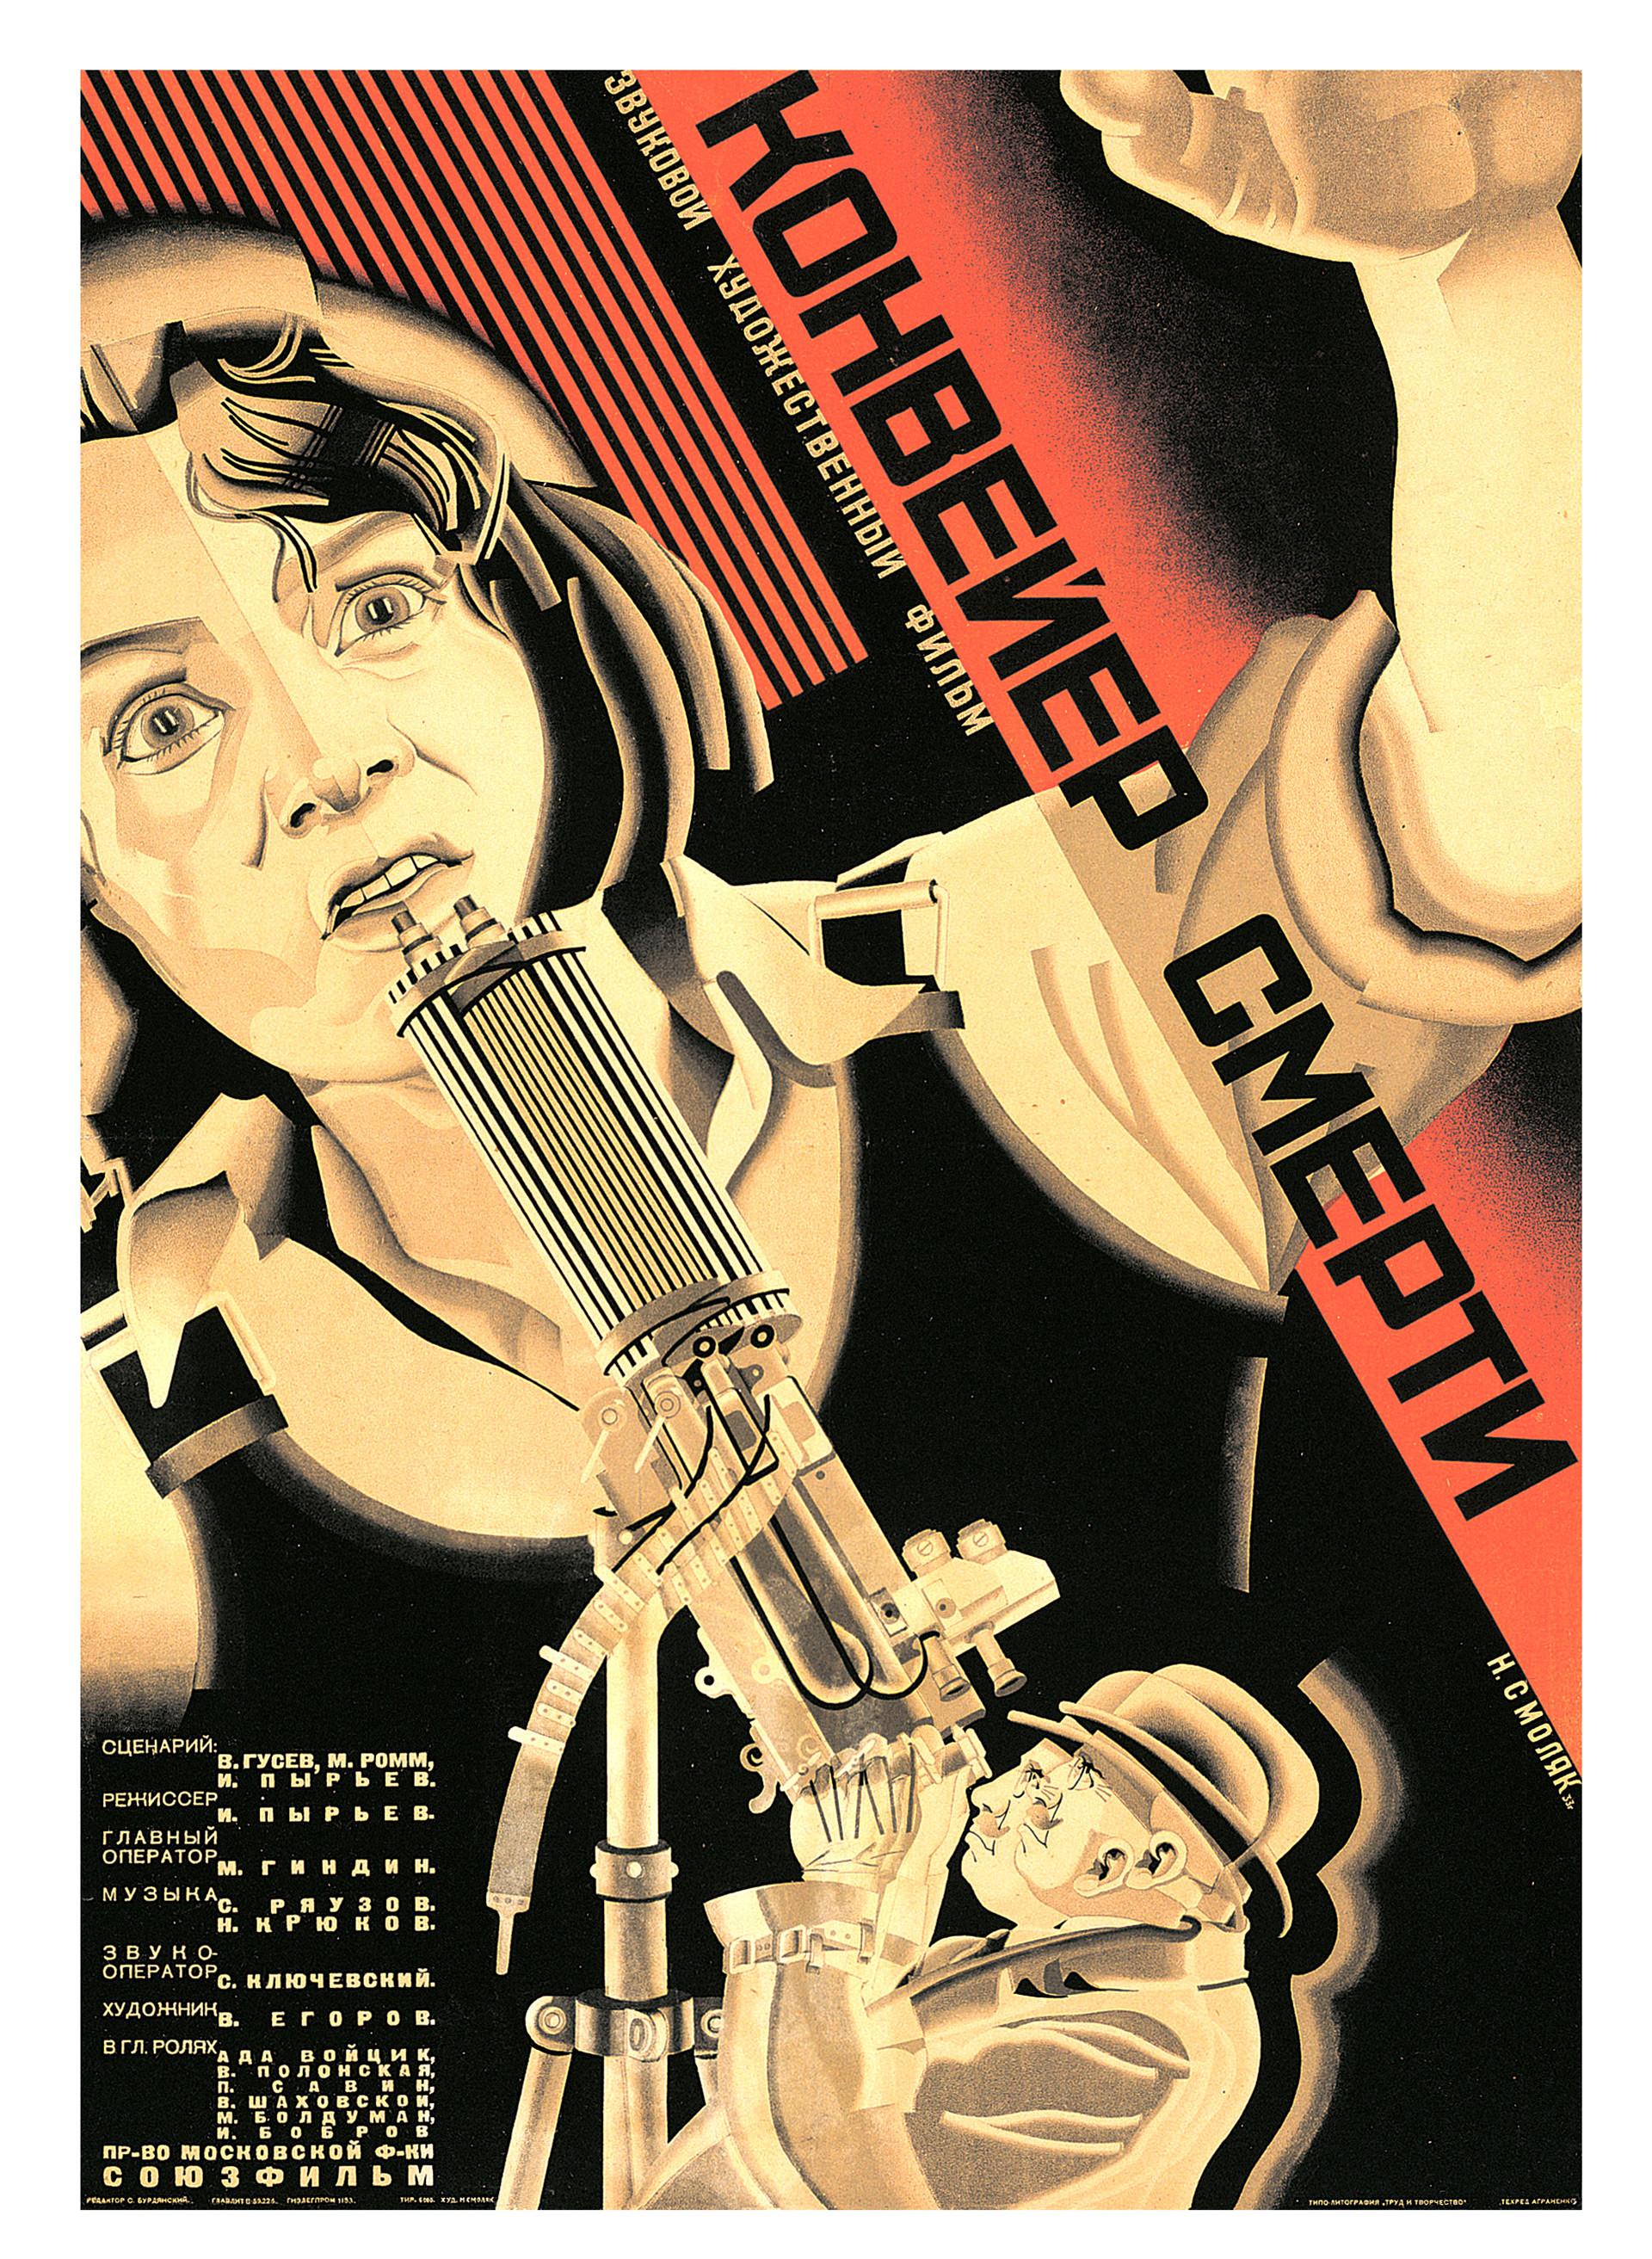 Smolyakovsky, poster cinematografico di Konveier smerti, 1933